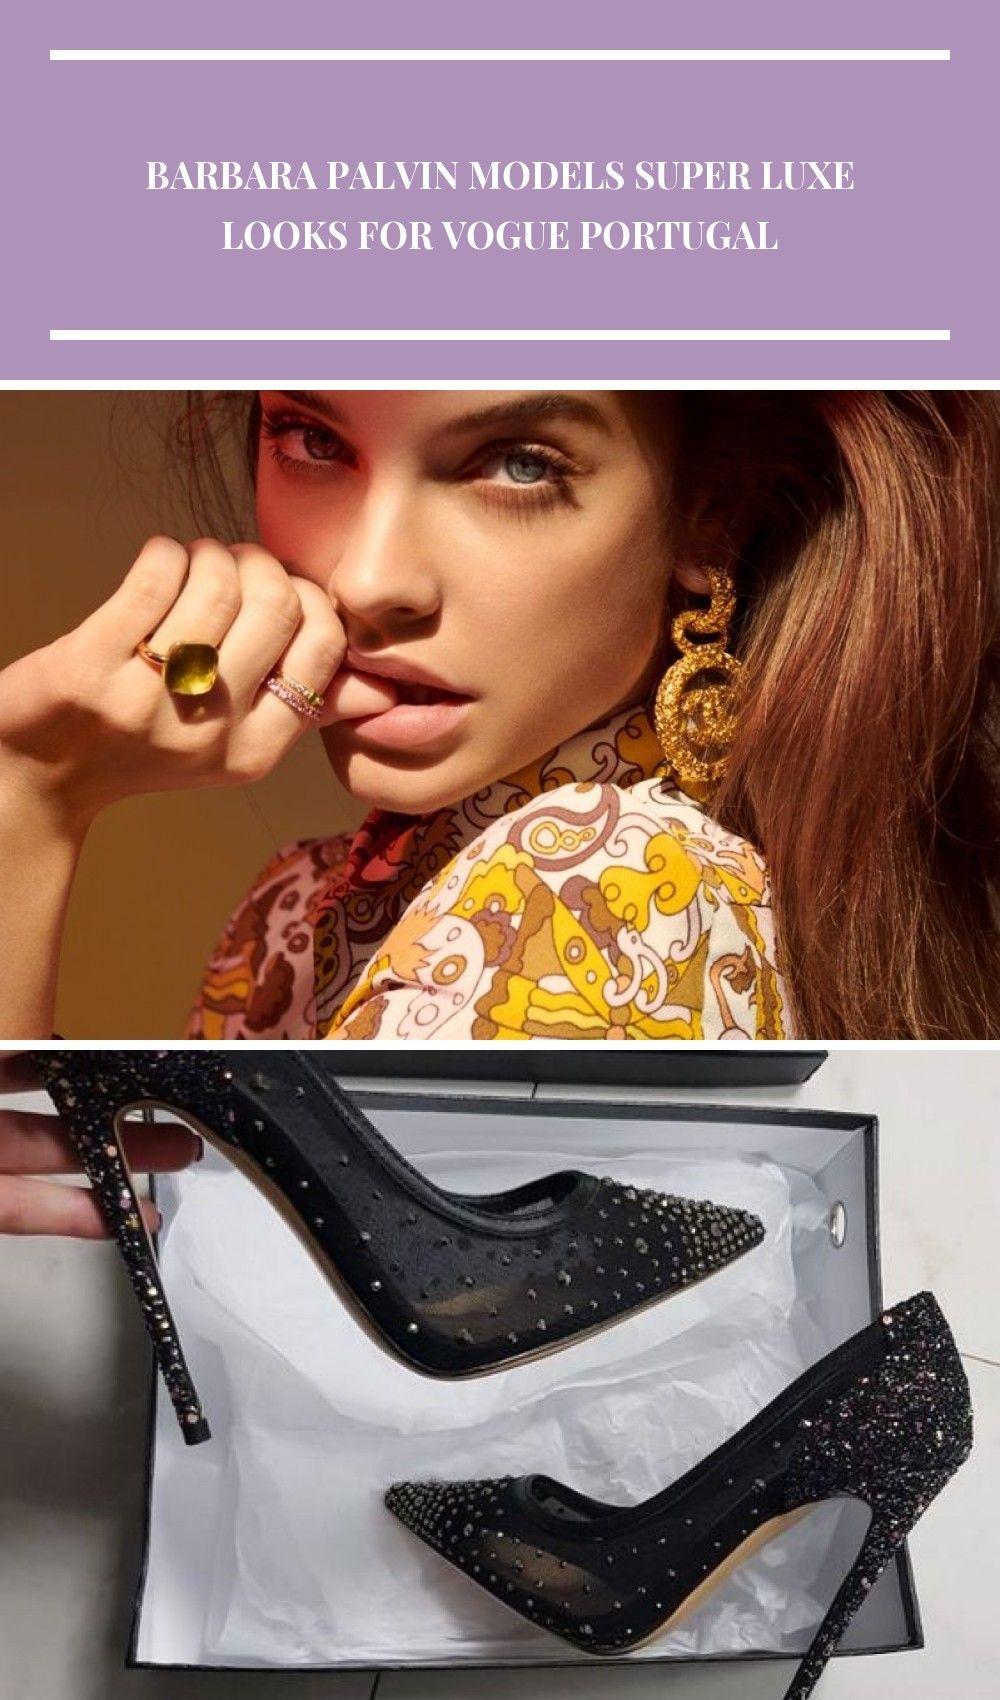 Photo of Barbara Palvin | Glam Jewelry Editorial | Vogue Portugal Cover portugal Barbara …